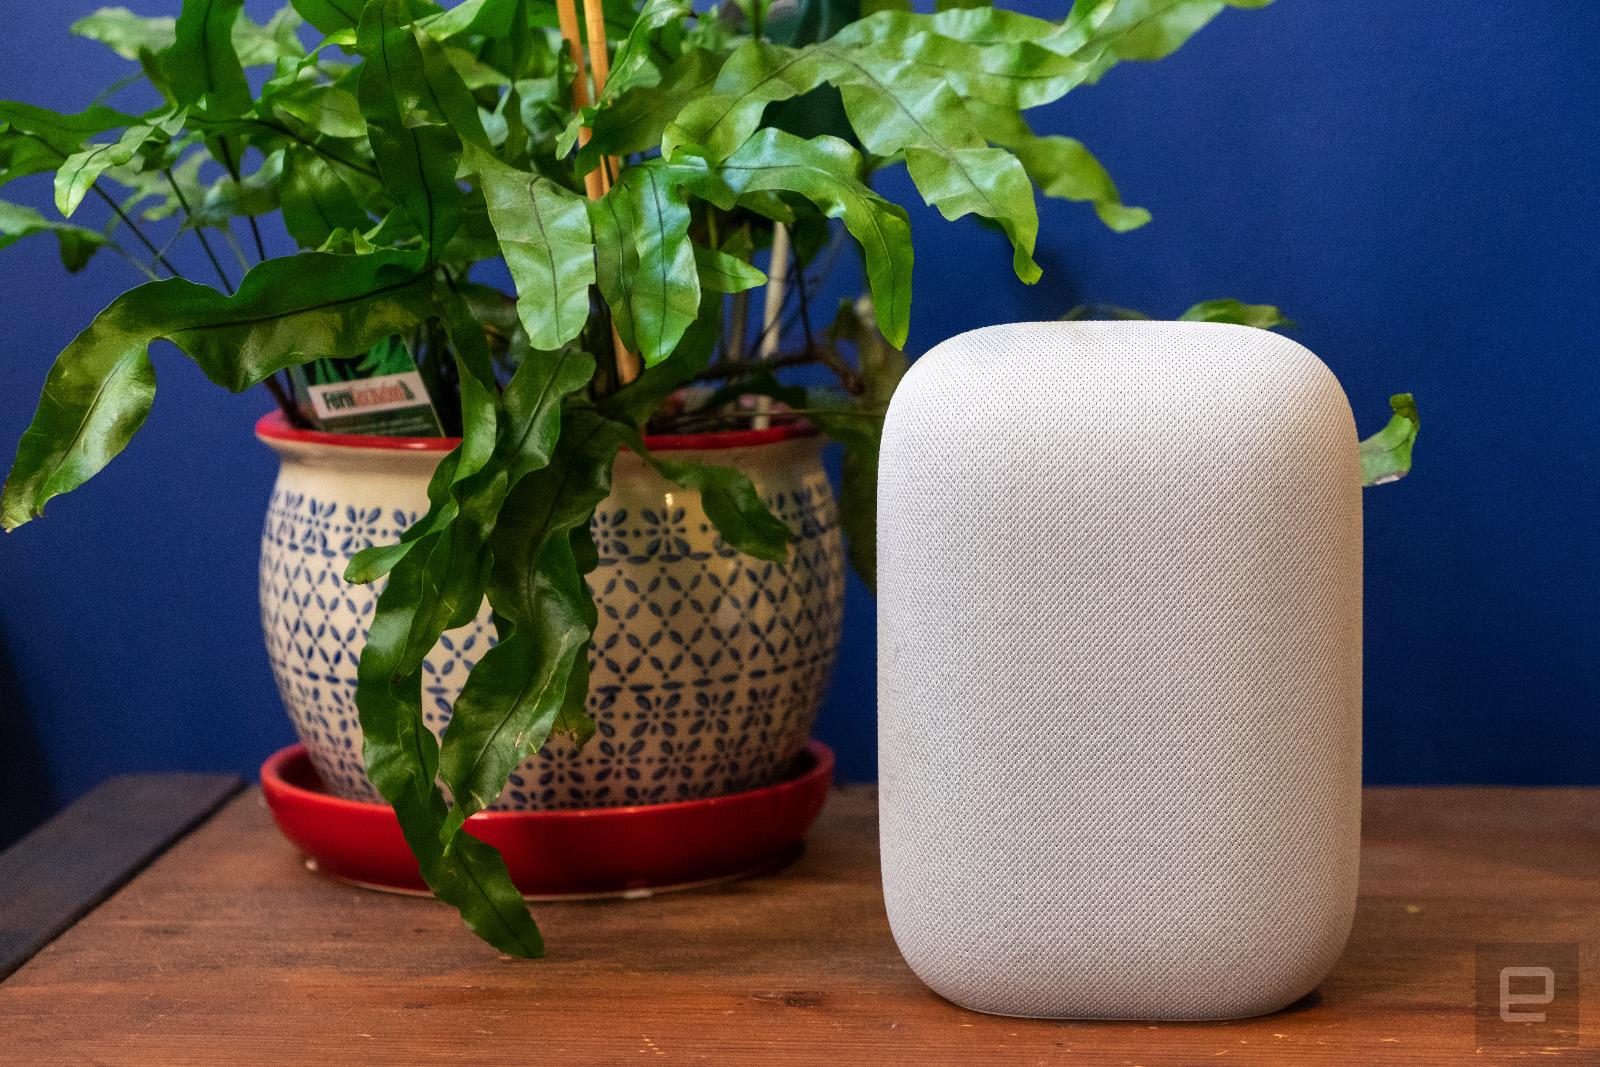 Google'ın Nest Audio akıllı hoparlörü şu anda 80$'a satışta | Engadget